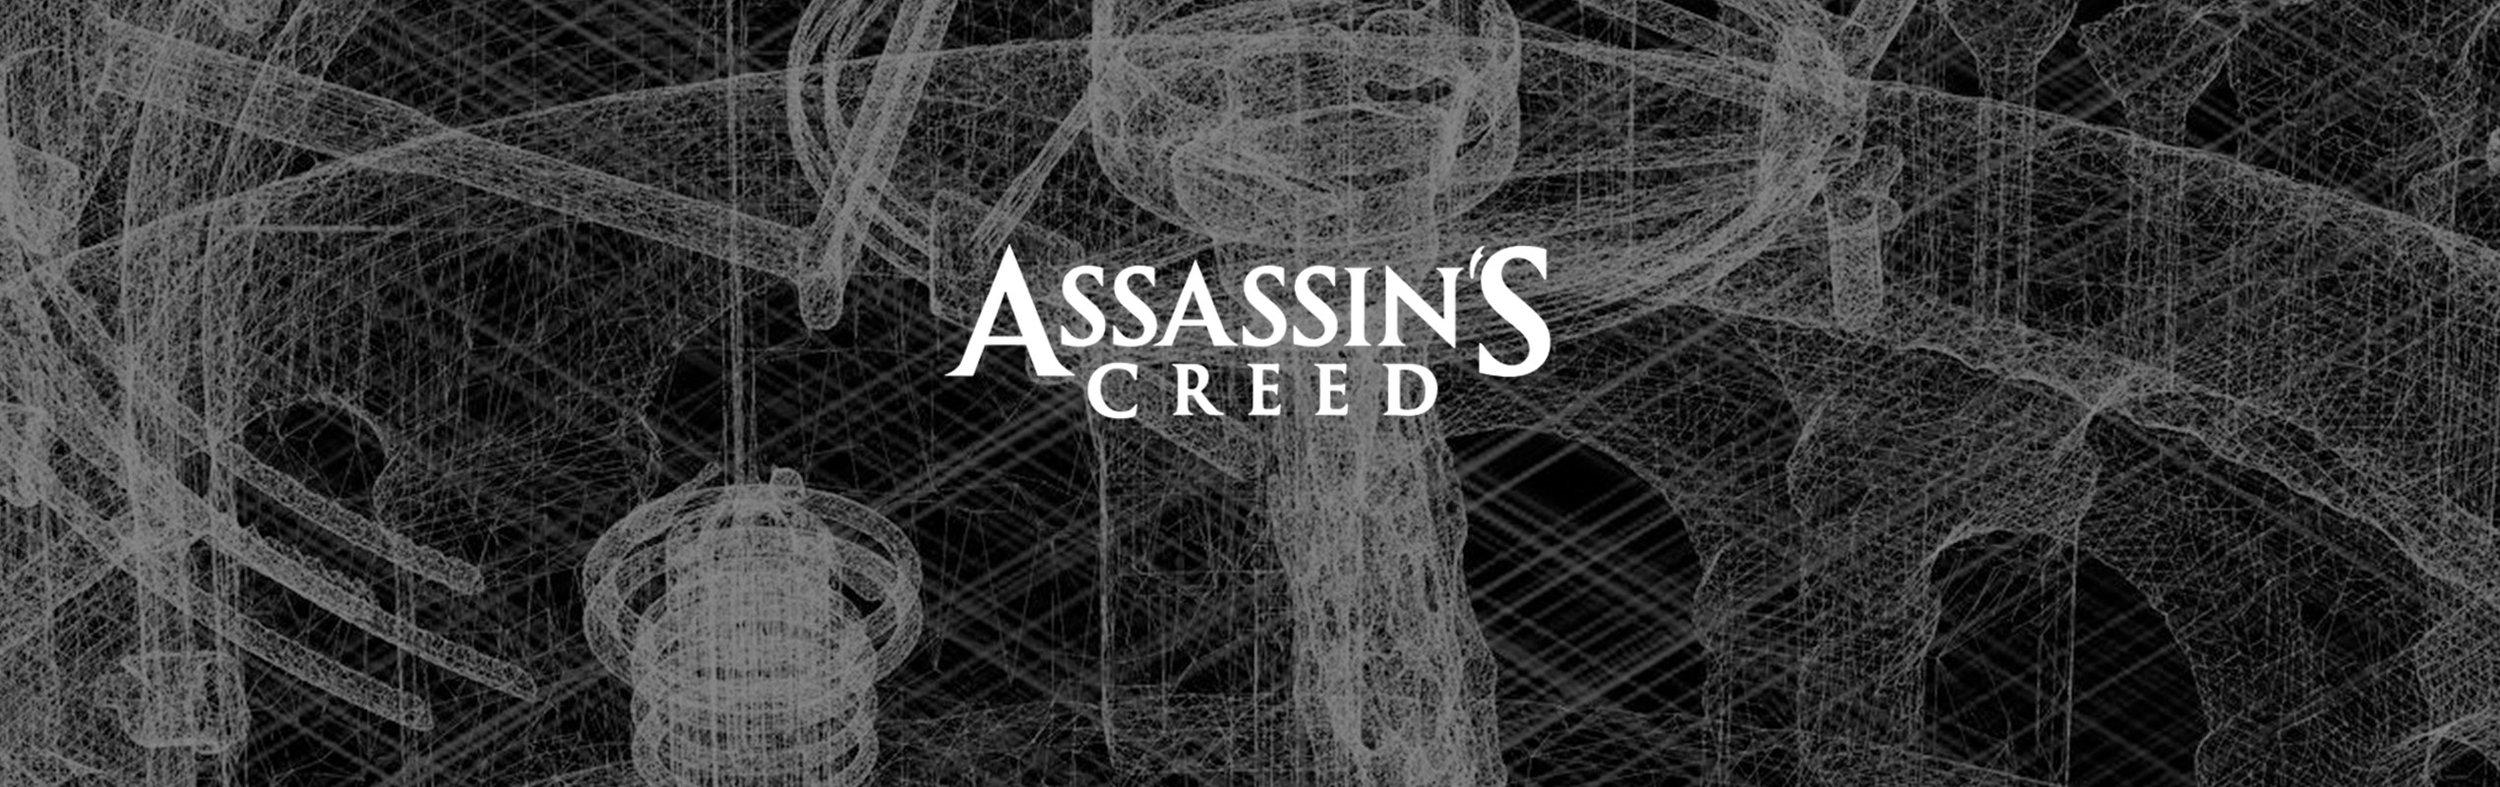 DanMartin_Home_AssassinsCreed-1.jpg